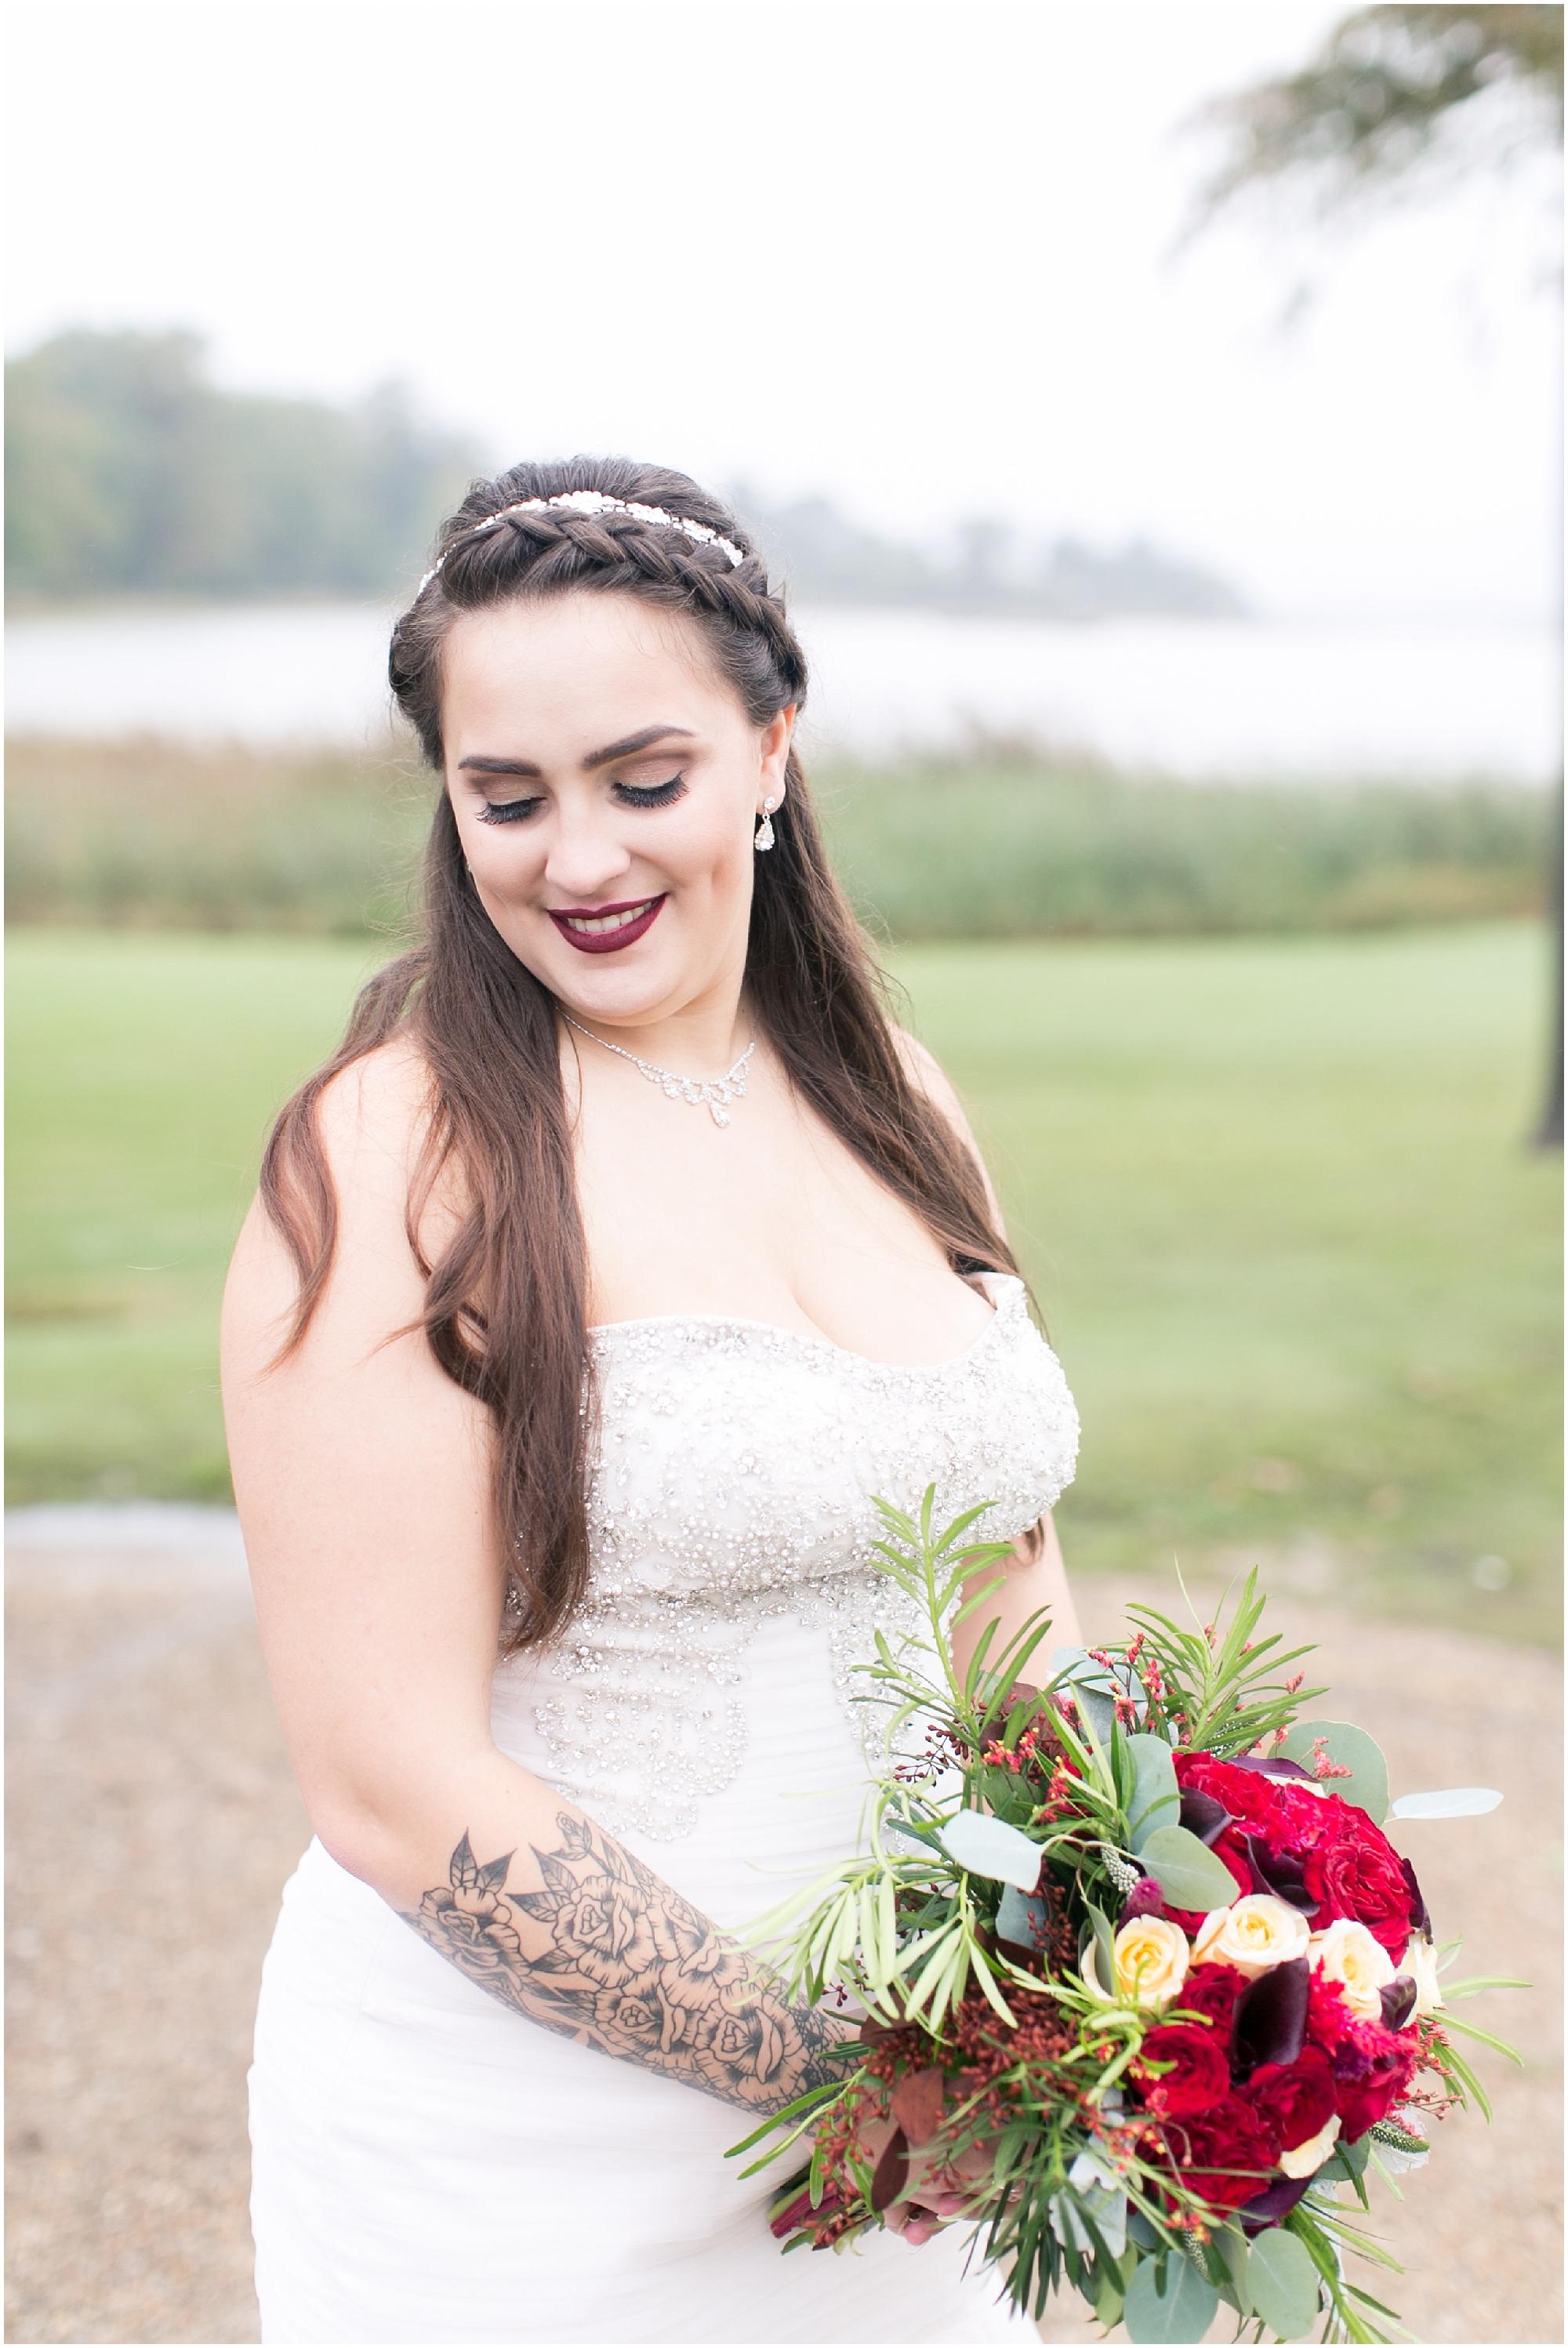 here and now bridal wedding dress, studio i do groom, suit, gourmet gang, fall wedding flowers, bailey galifant makeup artist and hair stylist, obici house wedding in suffolk virginia, virginia wedding photographer